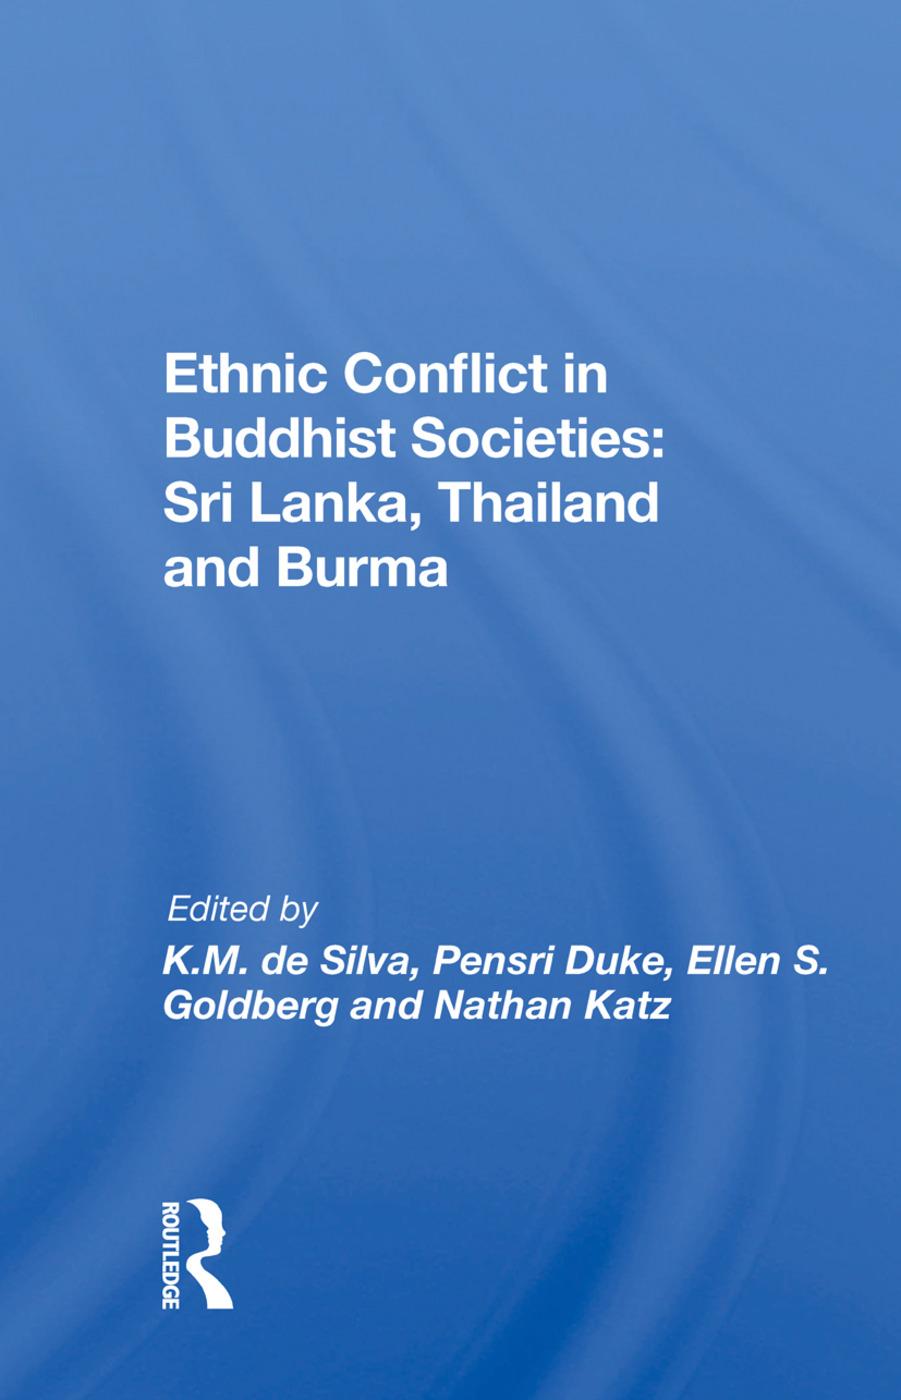 Ethnic Conflict in Buddhist Societies: Sri Lanka, Thailand and Burma